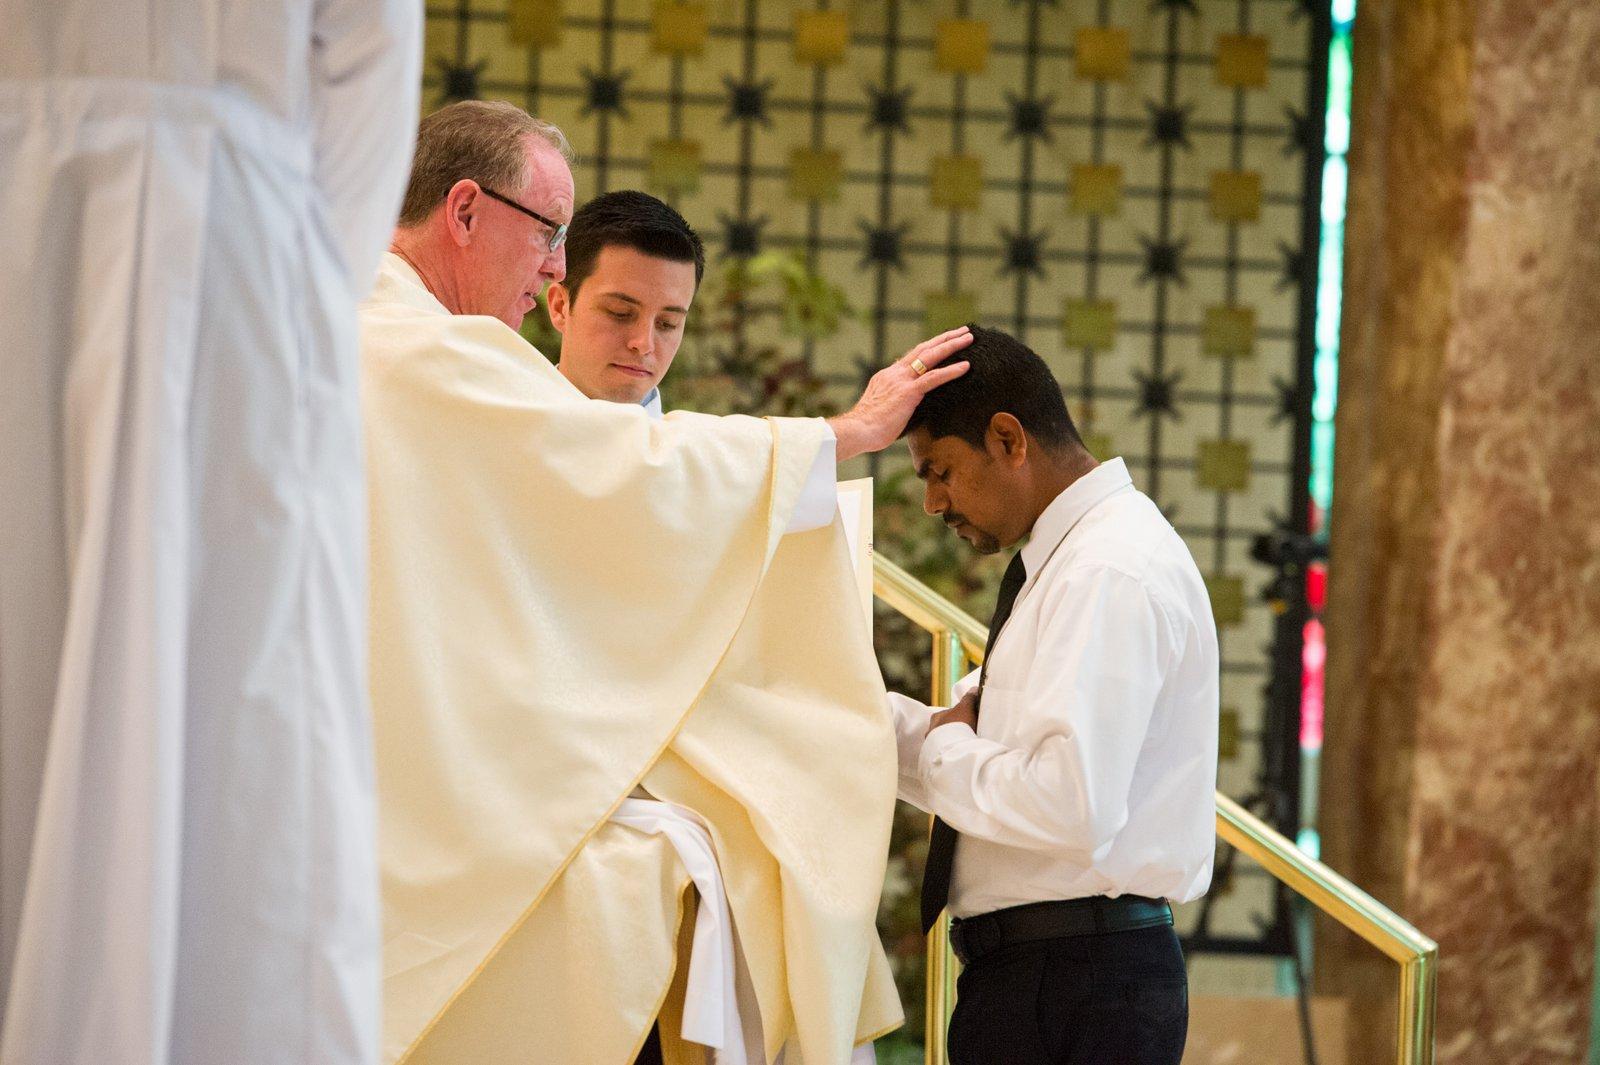 Sarfraz Alam professes his first vows